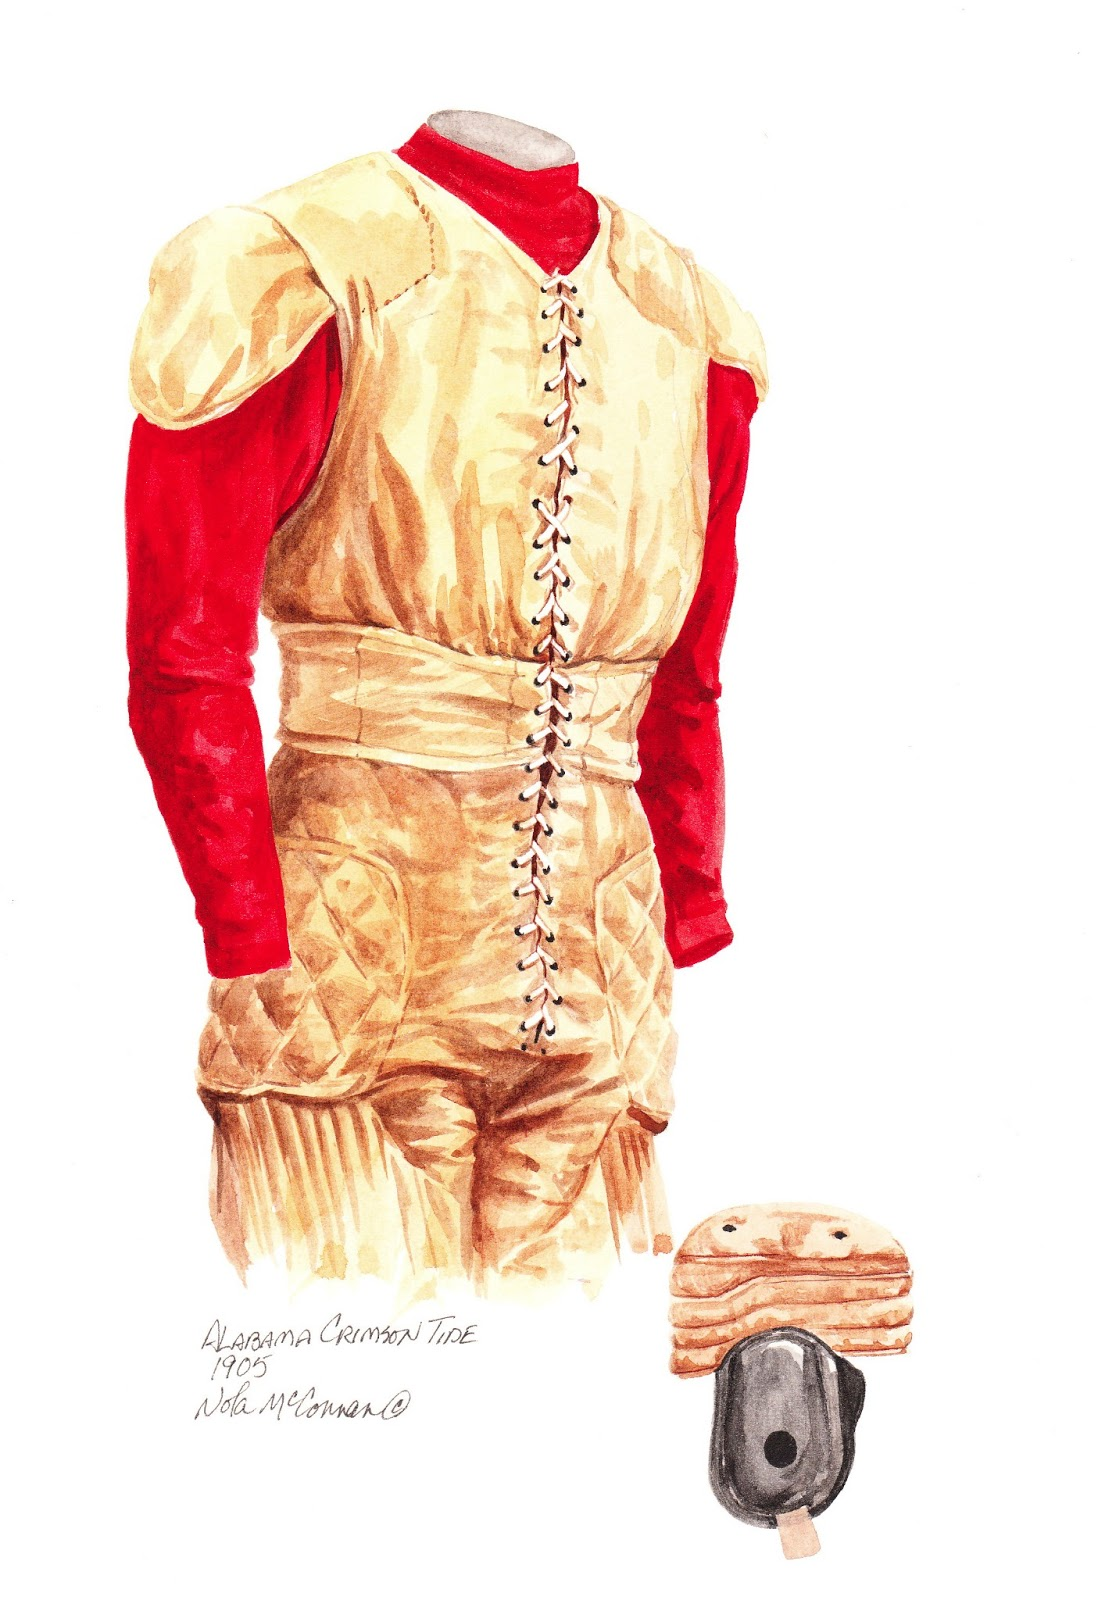 84b50b4c4 1905 Alabama Crimson Tide football uniform original art for sale